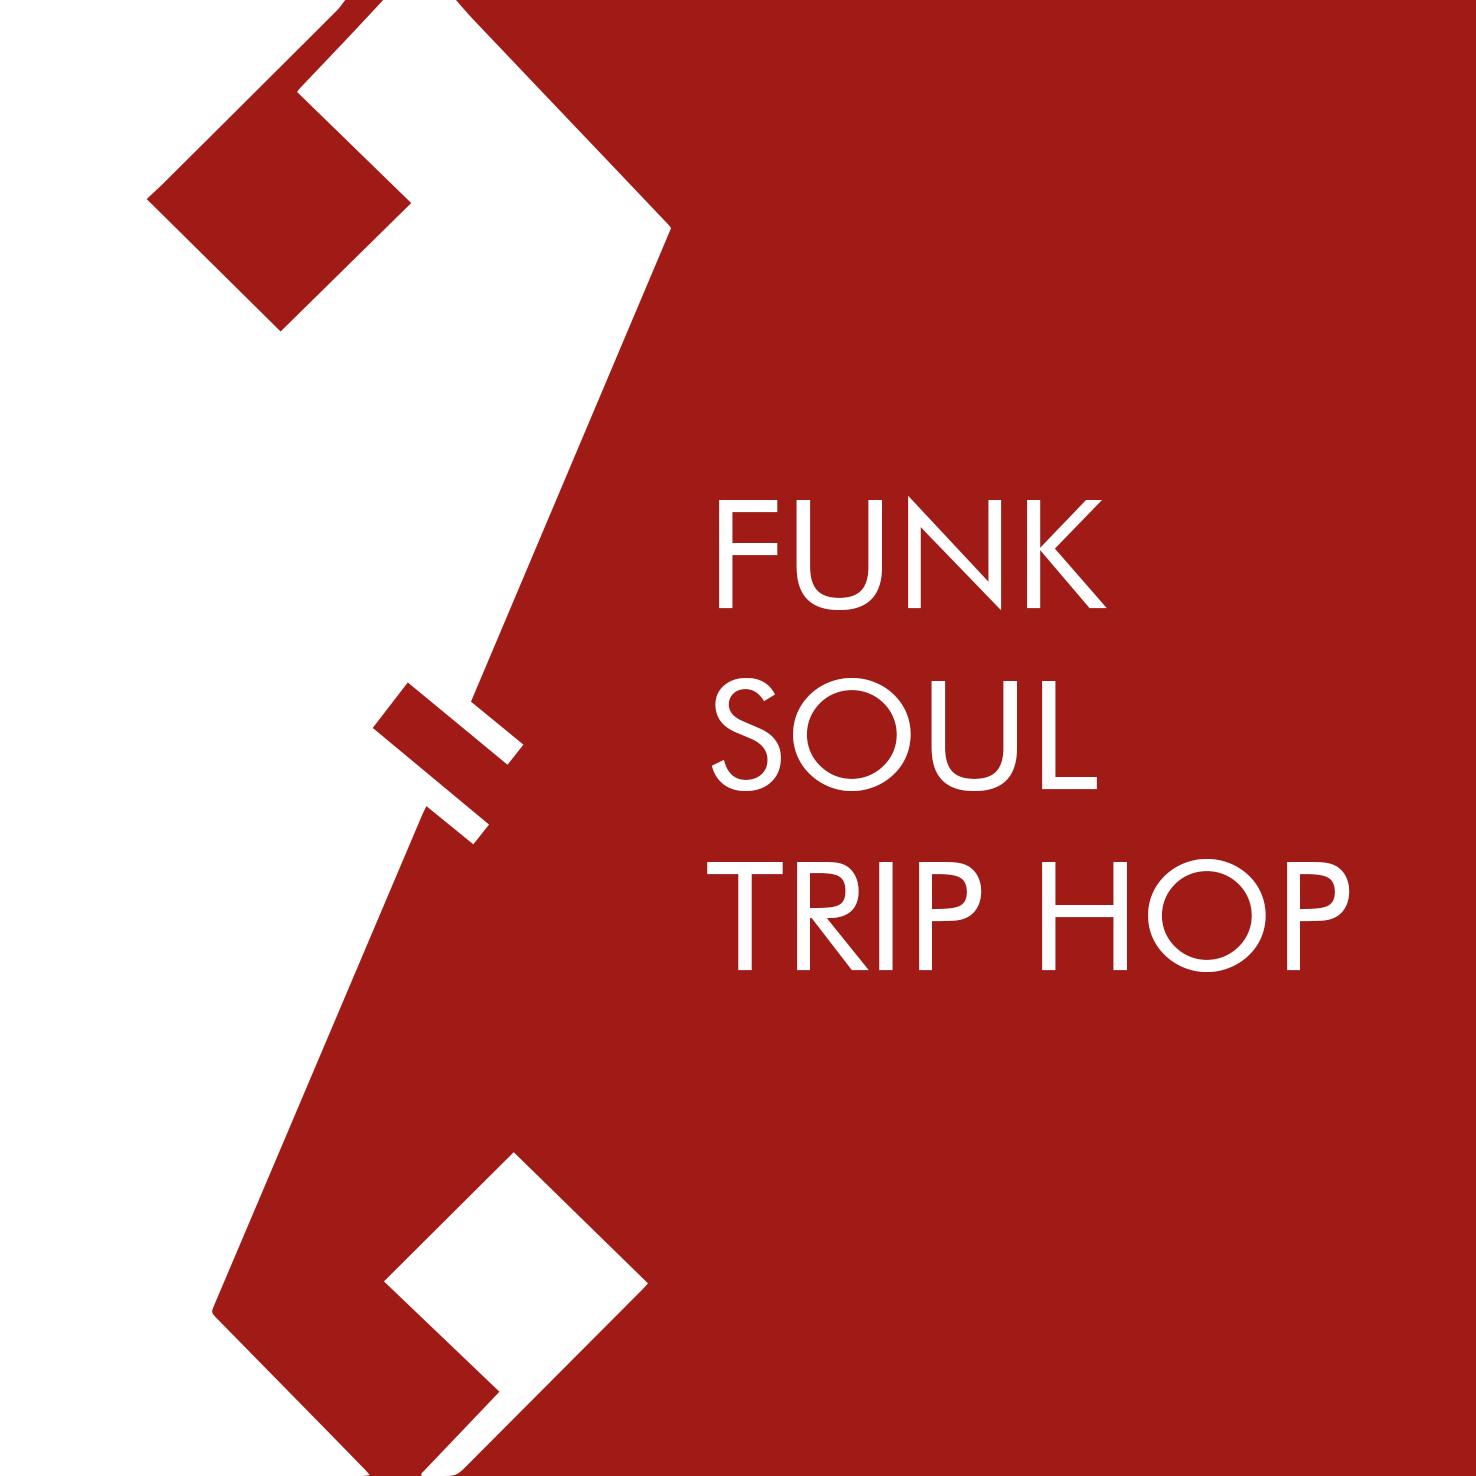 FUNK - SOUL - TRIP HOP